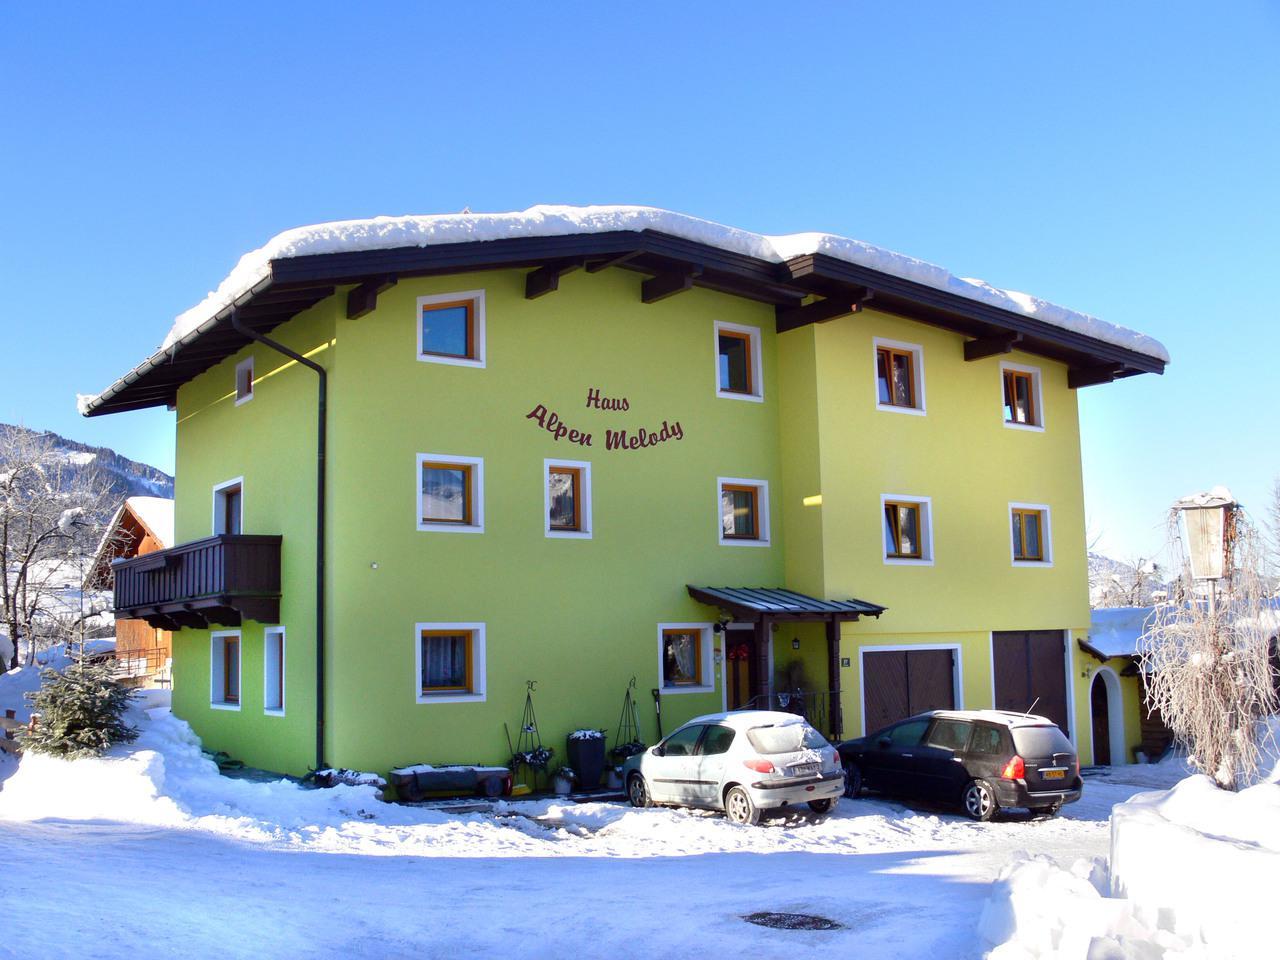 Haus Alpen Melody